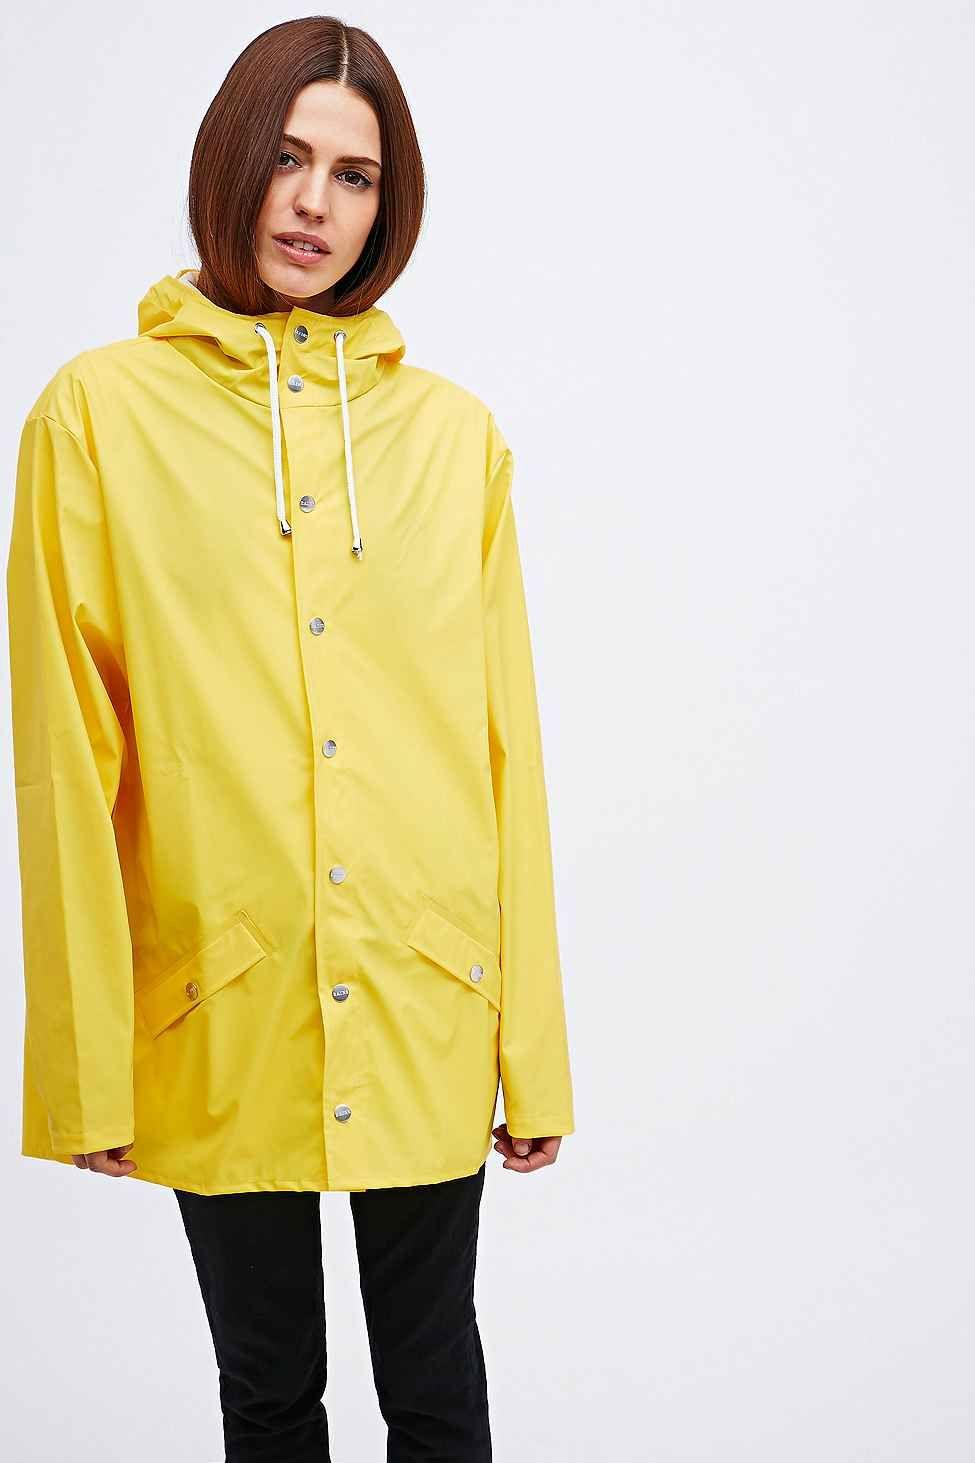 Rains Jacket In Yellow Wear Raincoat